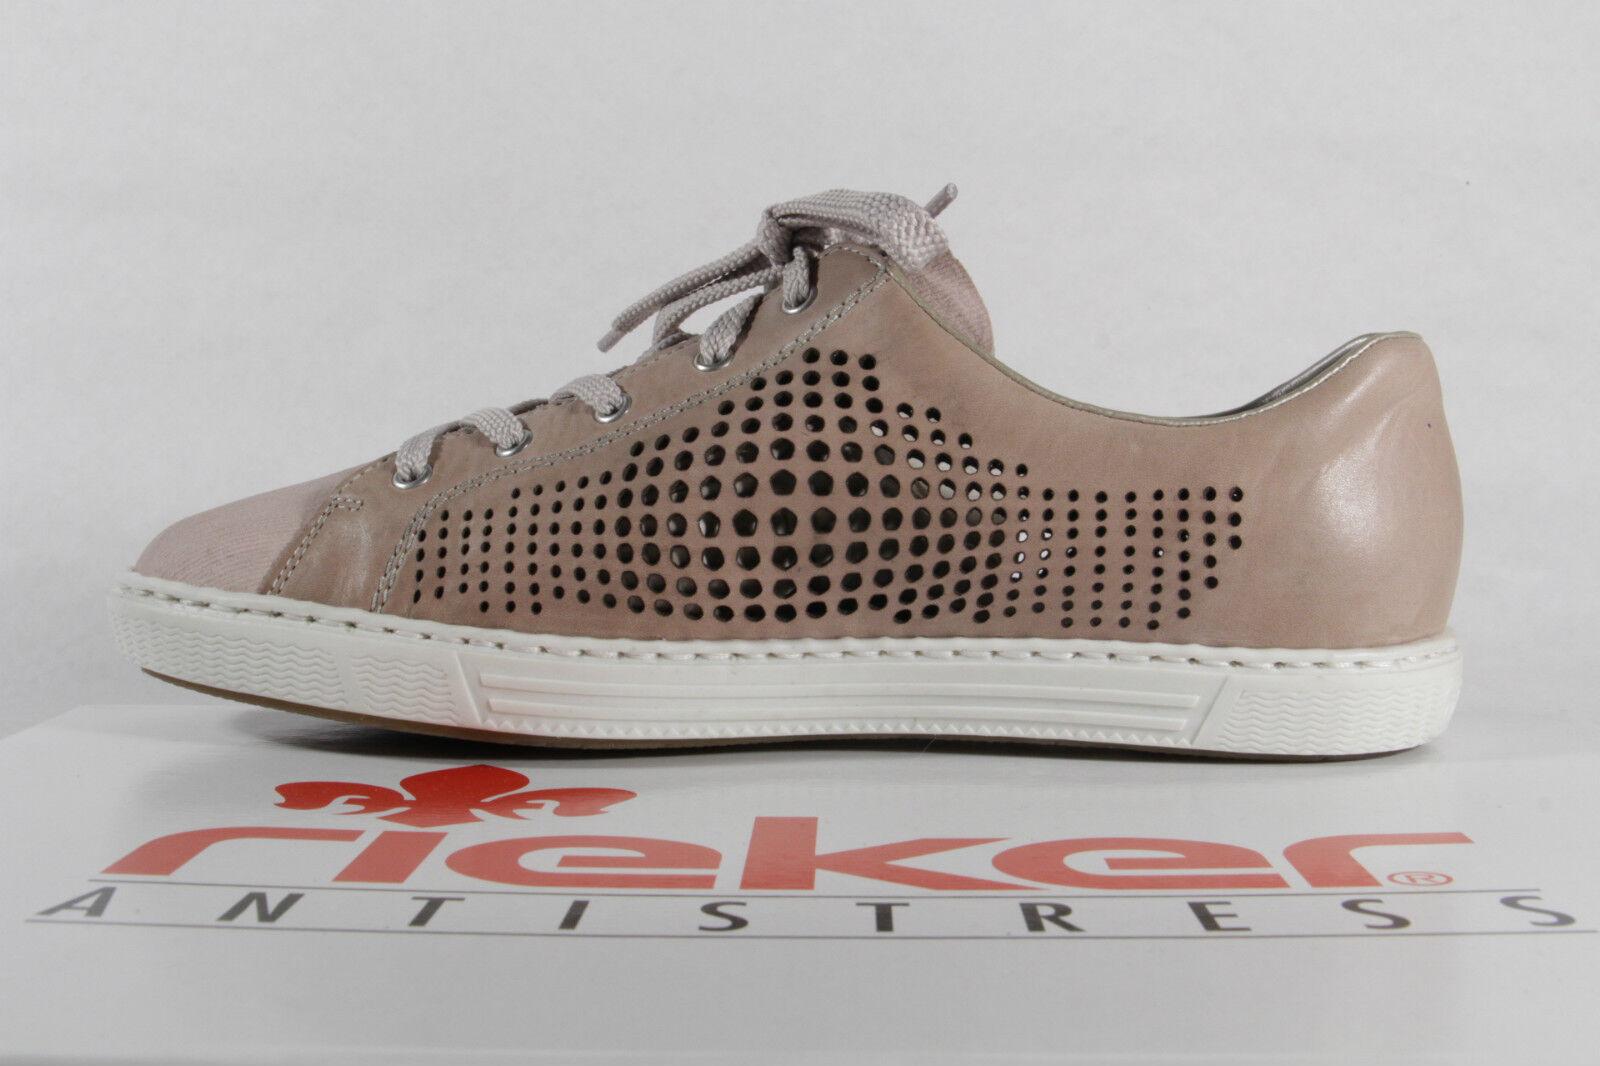 Rieker Women's Lace-Up shoes, Low shoes, shoes, shoes, Trainers Faux Leather Beige pink NEW 4a9c0d